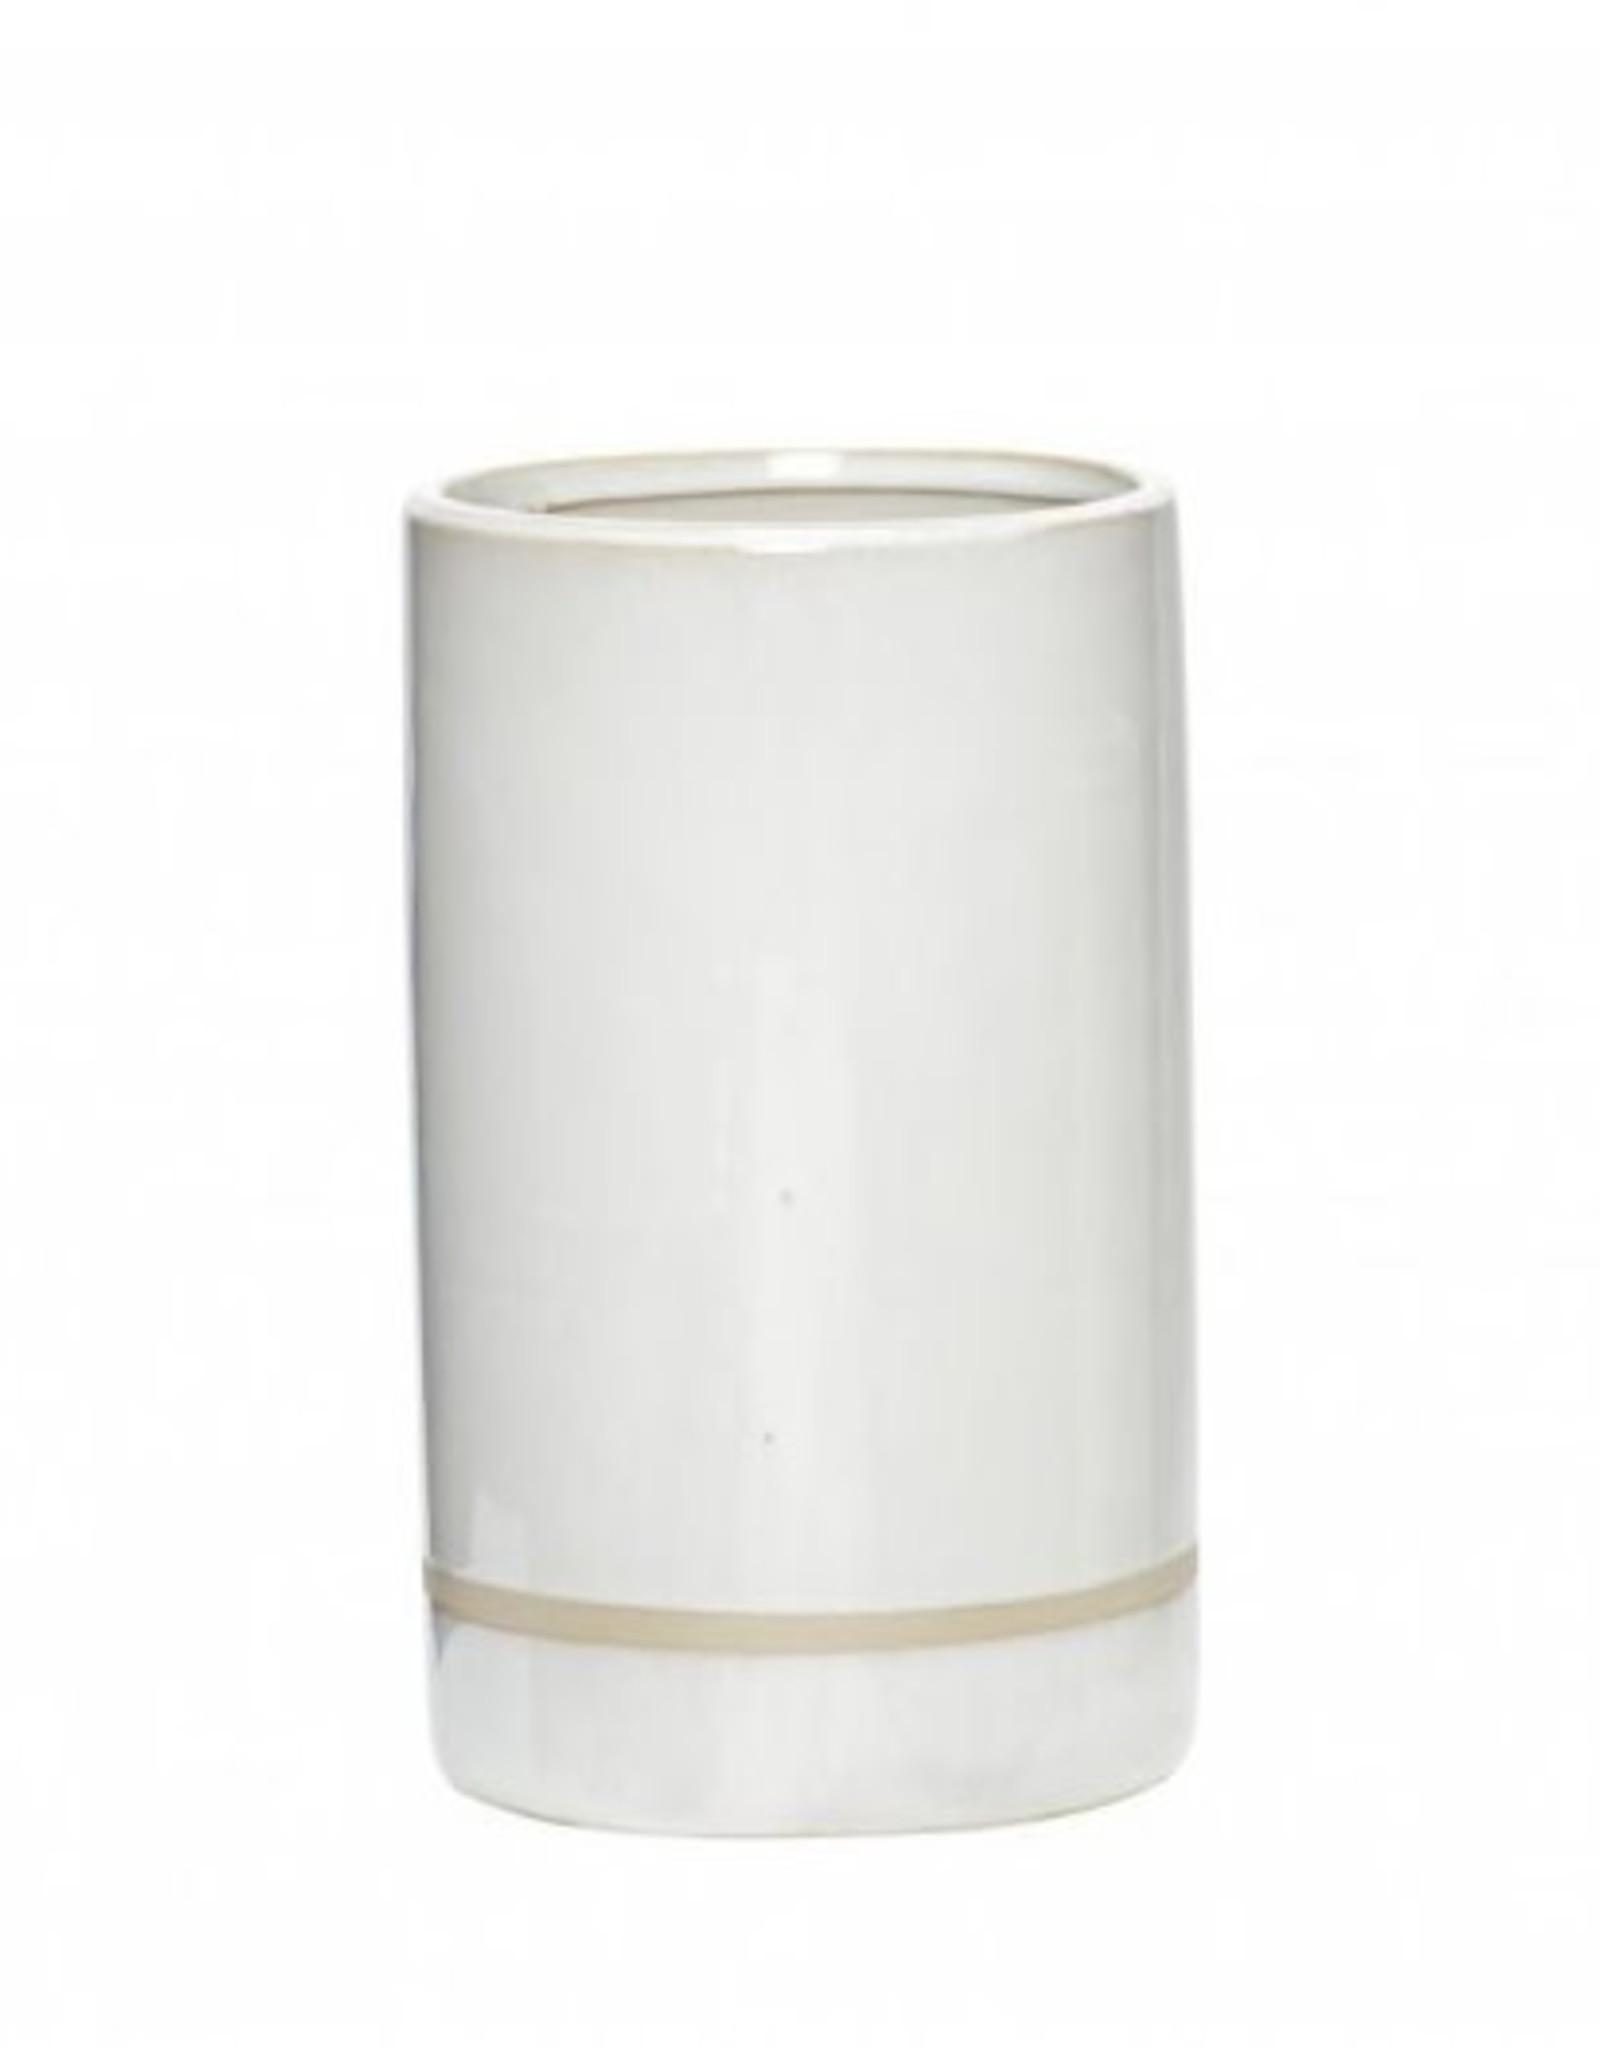 Hübsch Hübsch Pot Ceramics White/Sand 21cm